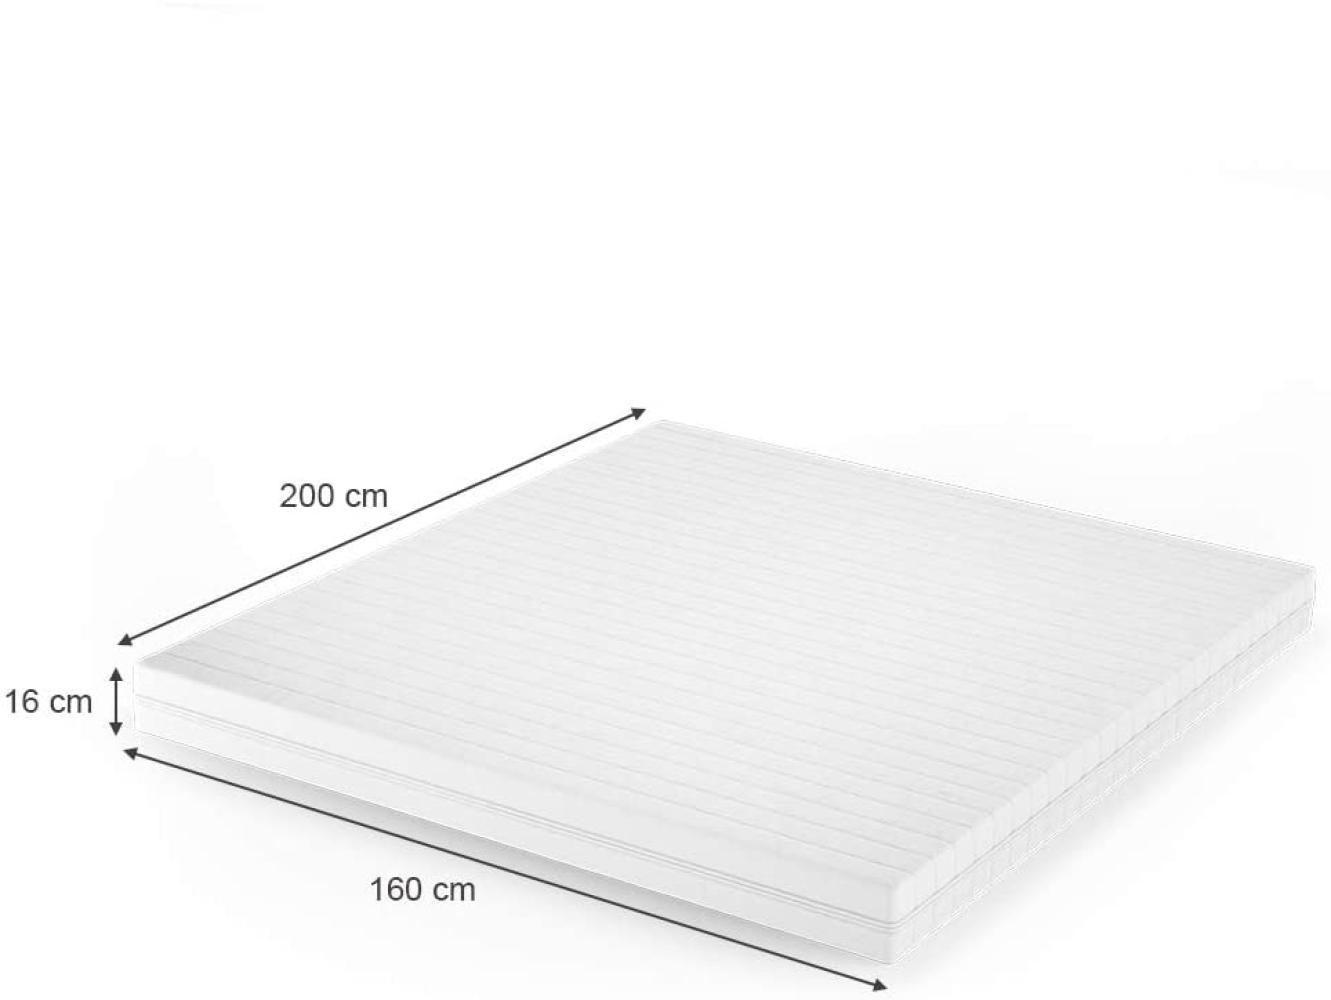 VitaliSpa 'Calma Comfort Plus' Schaummatratze mit Kaltschaumkern, H3 140x200 cm Bild 1